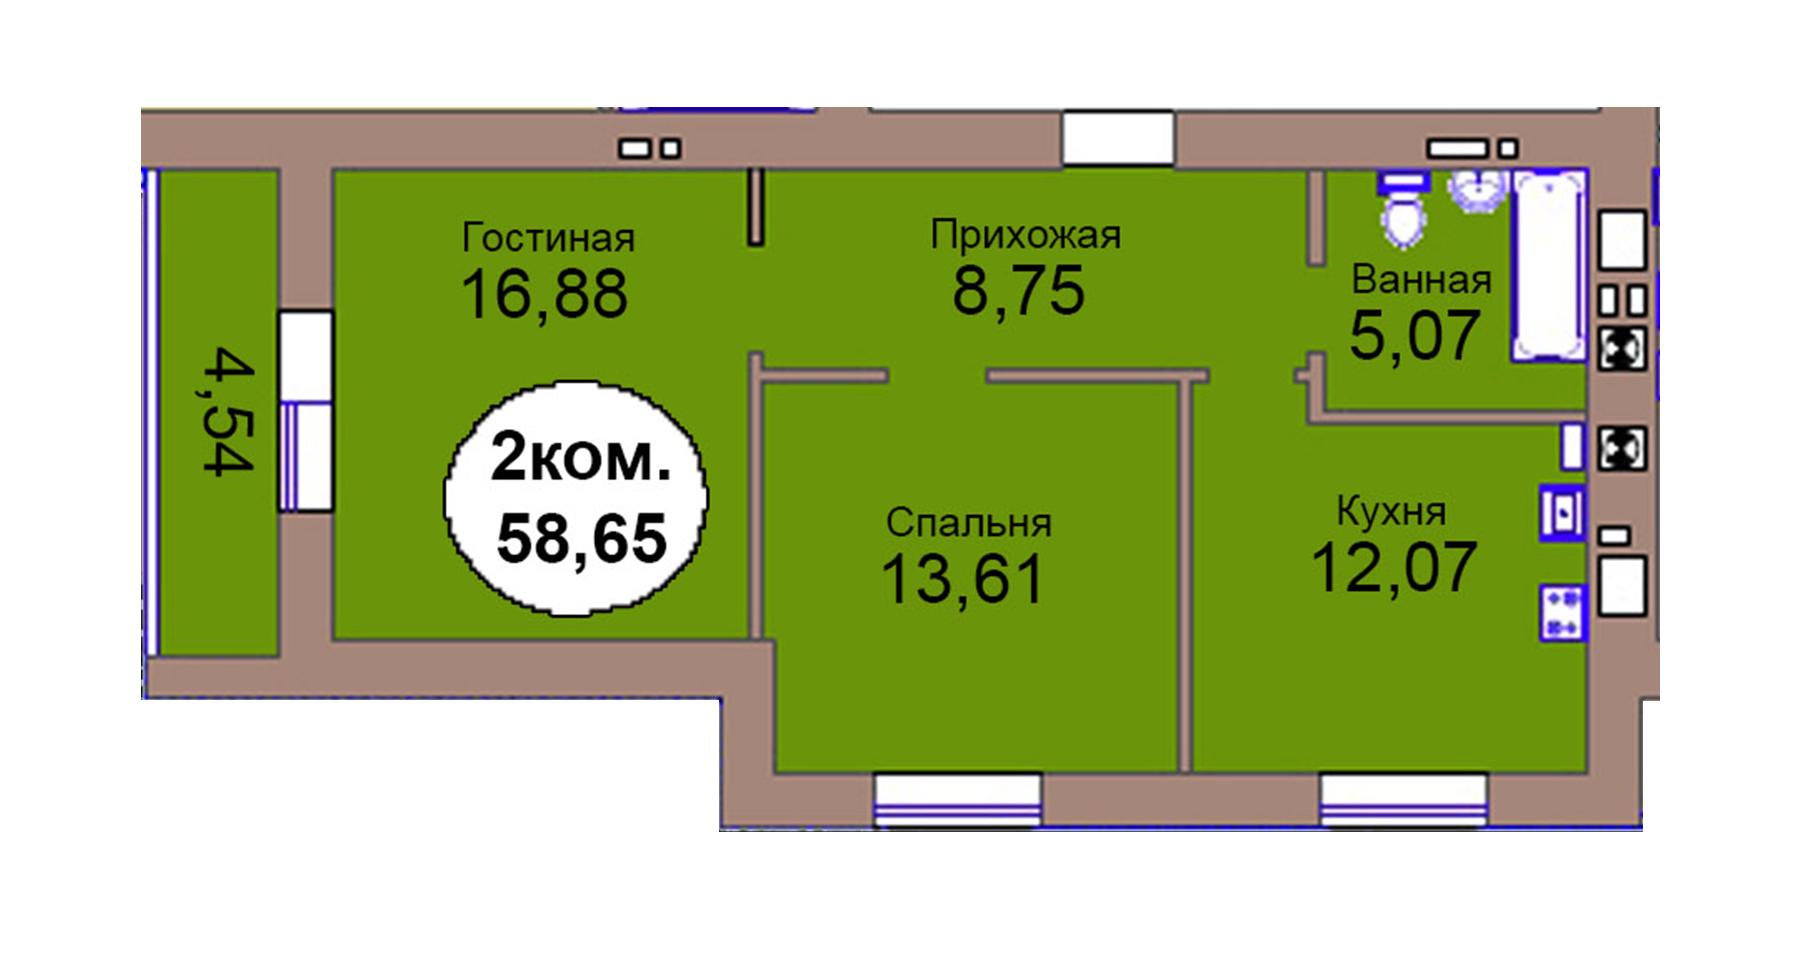 2-комн. кв. по пер. Калининградский, 4  кв. 122 в Калининграде